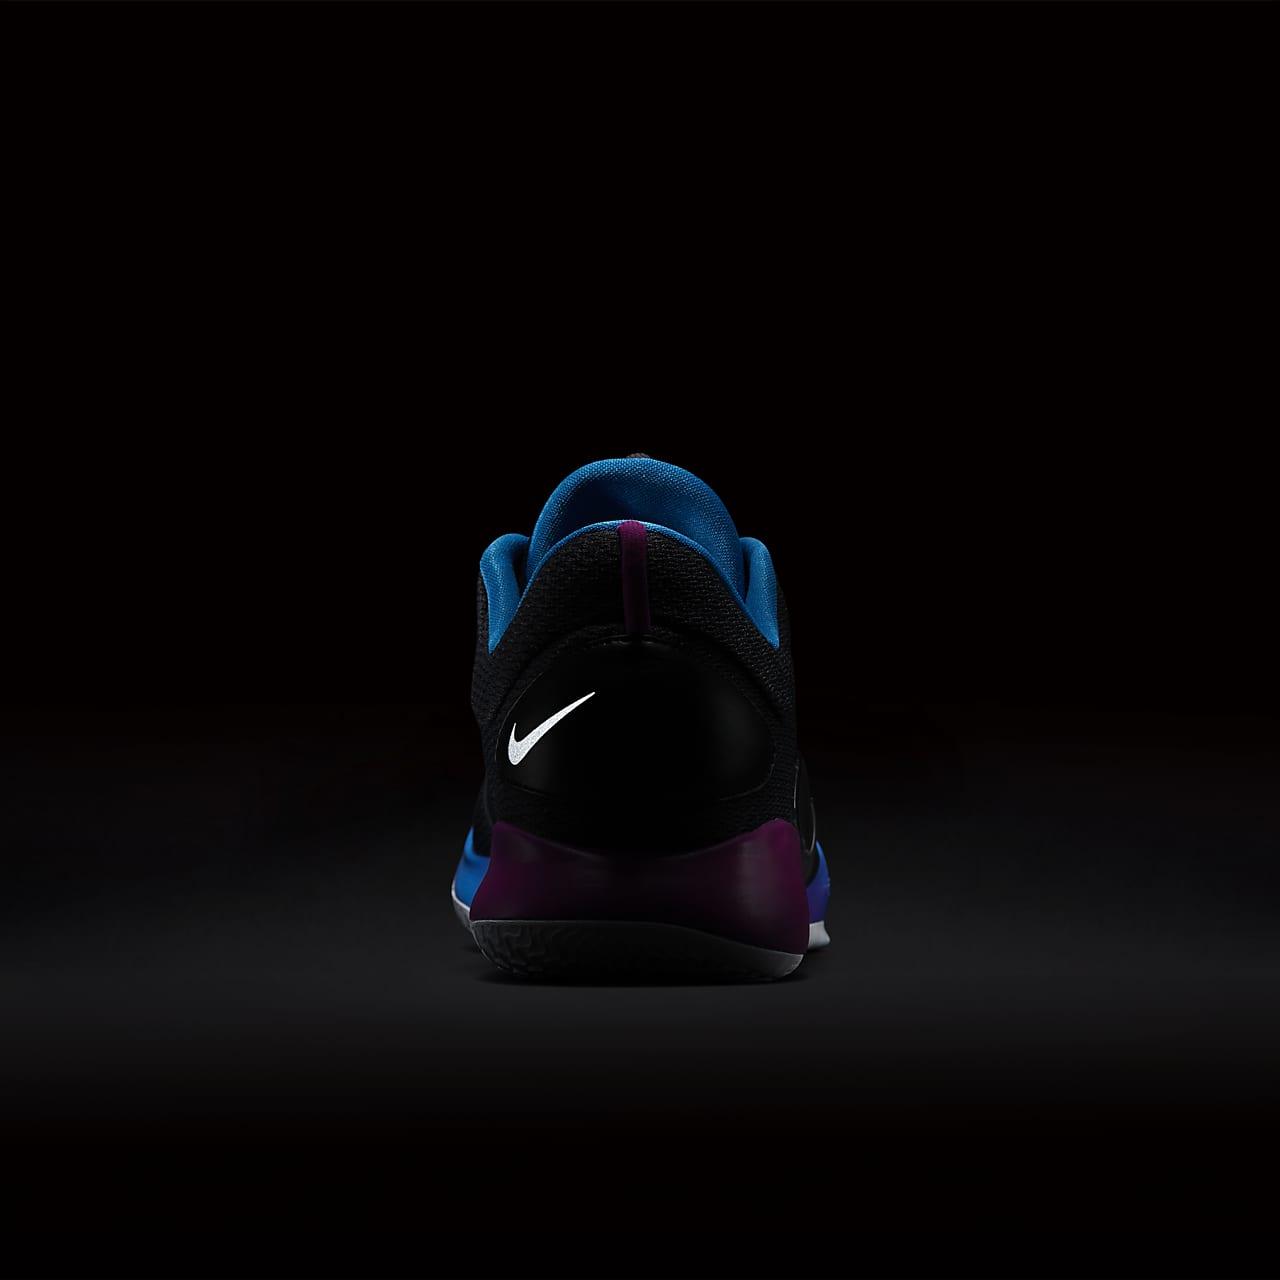 Nike Hyperdunk X Low Basketball Shoe